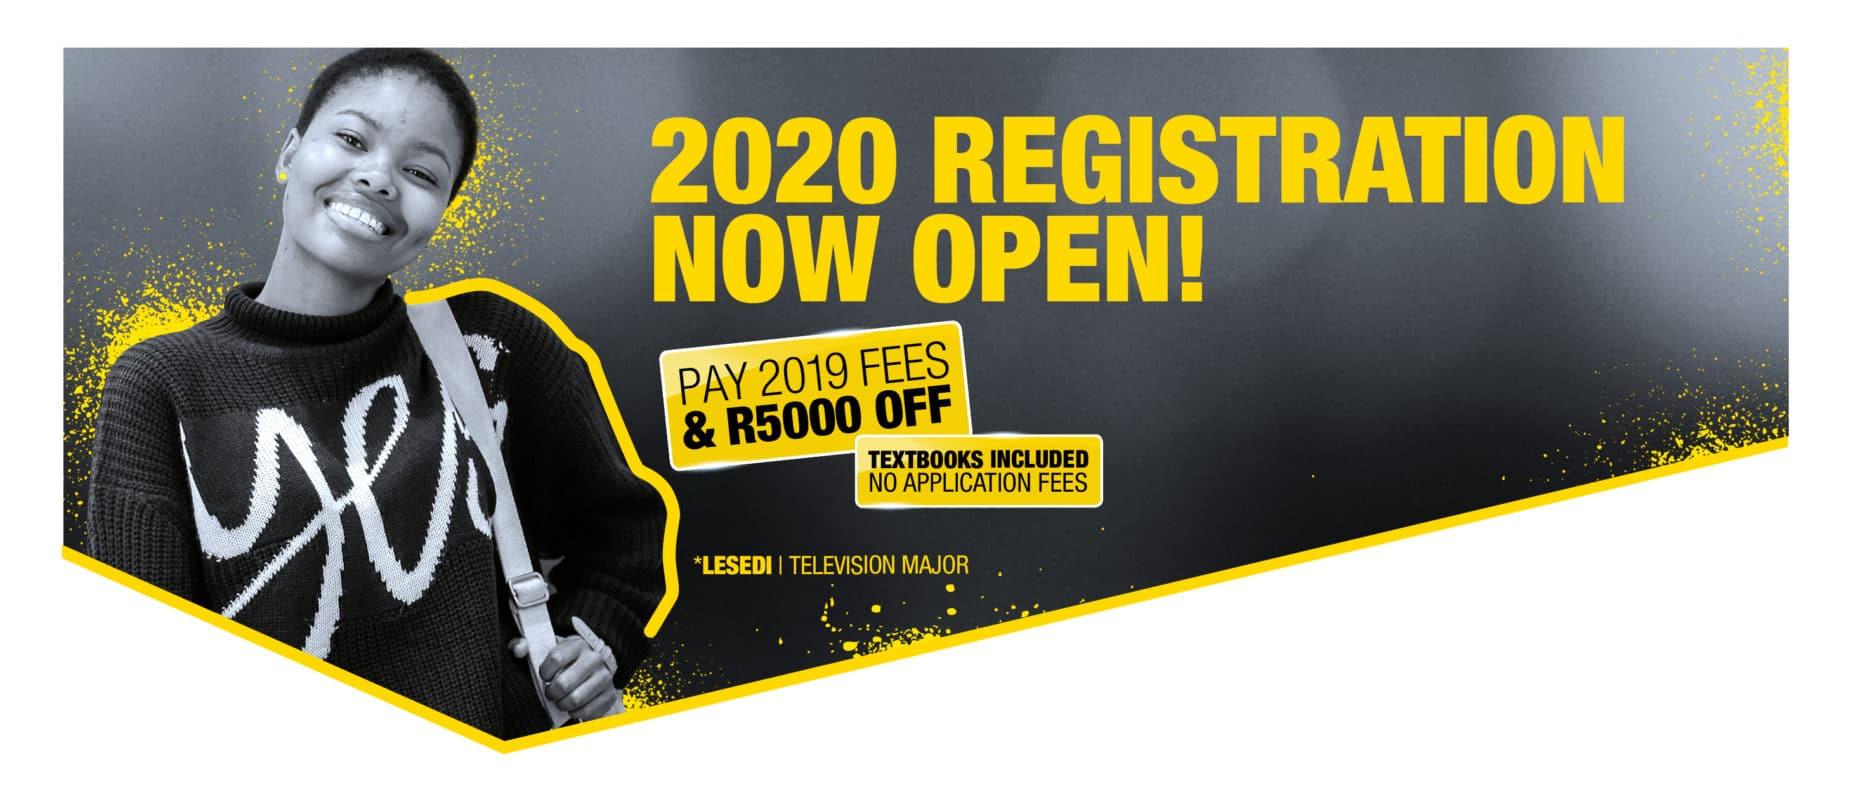 17833-BMH-2020-Website-Banner-Early-Registration-V02-1851x800